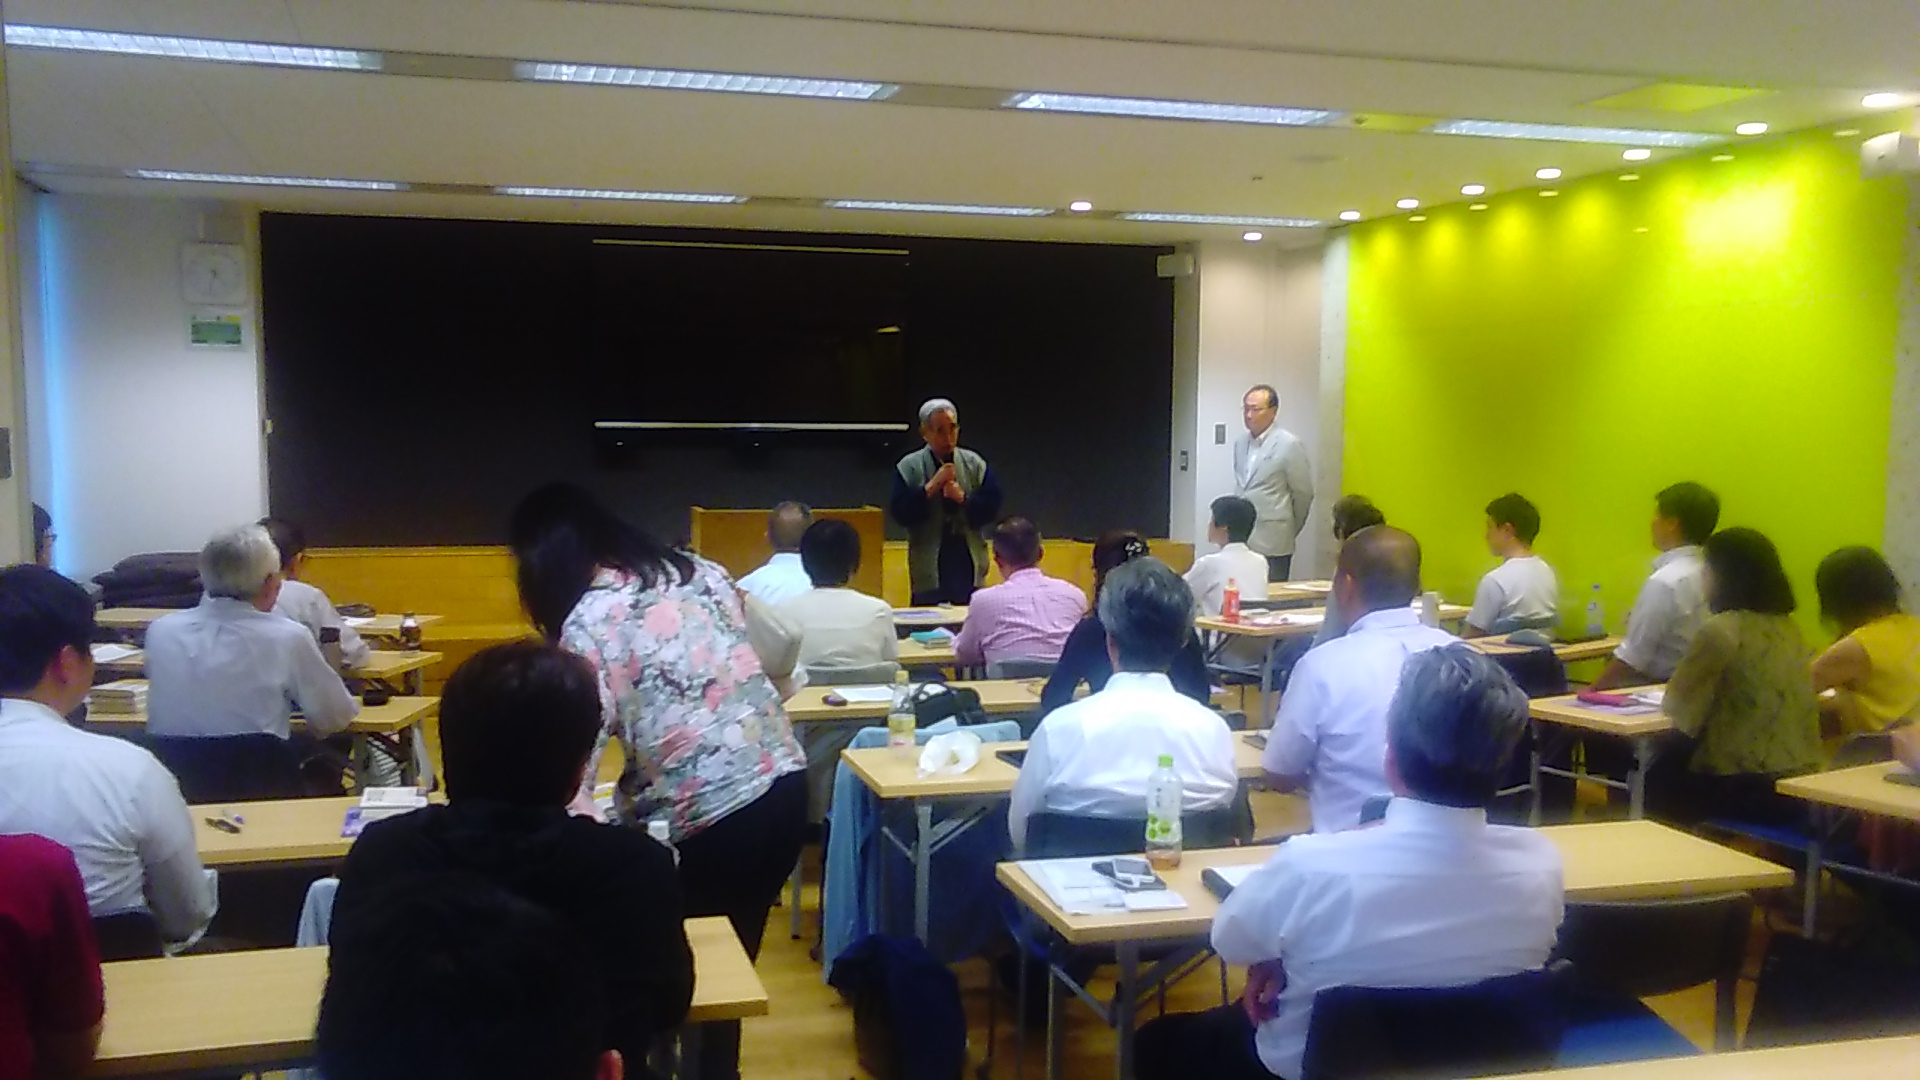 KIMG0822 1 - 2018年10月6日(土)第5回東京思風塾開催しました。